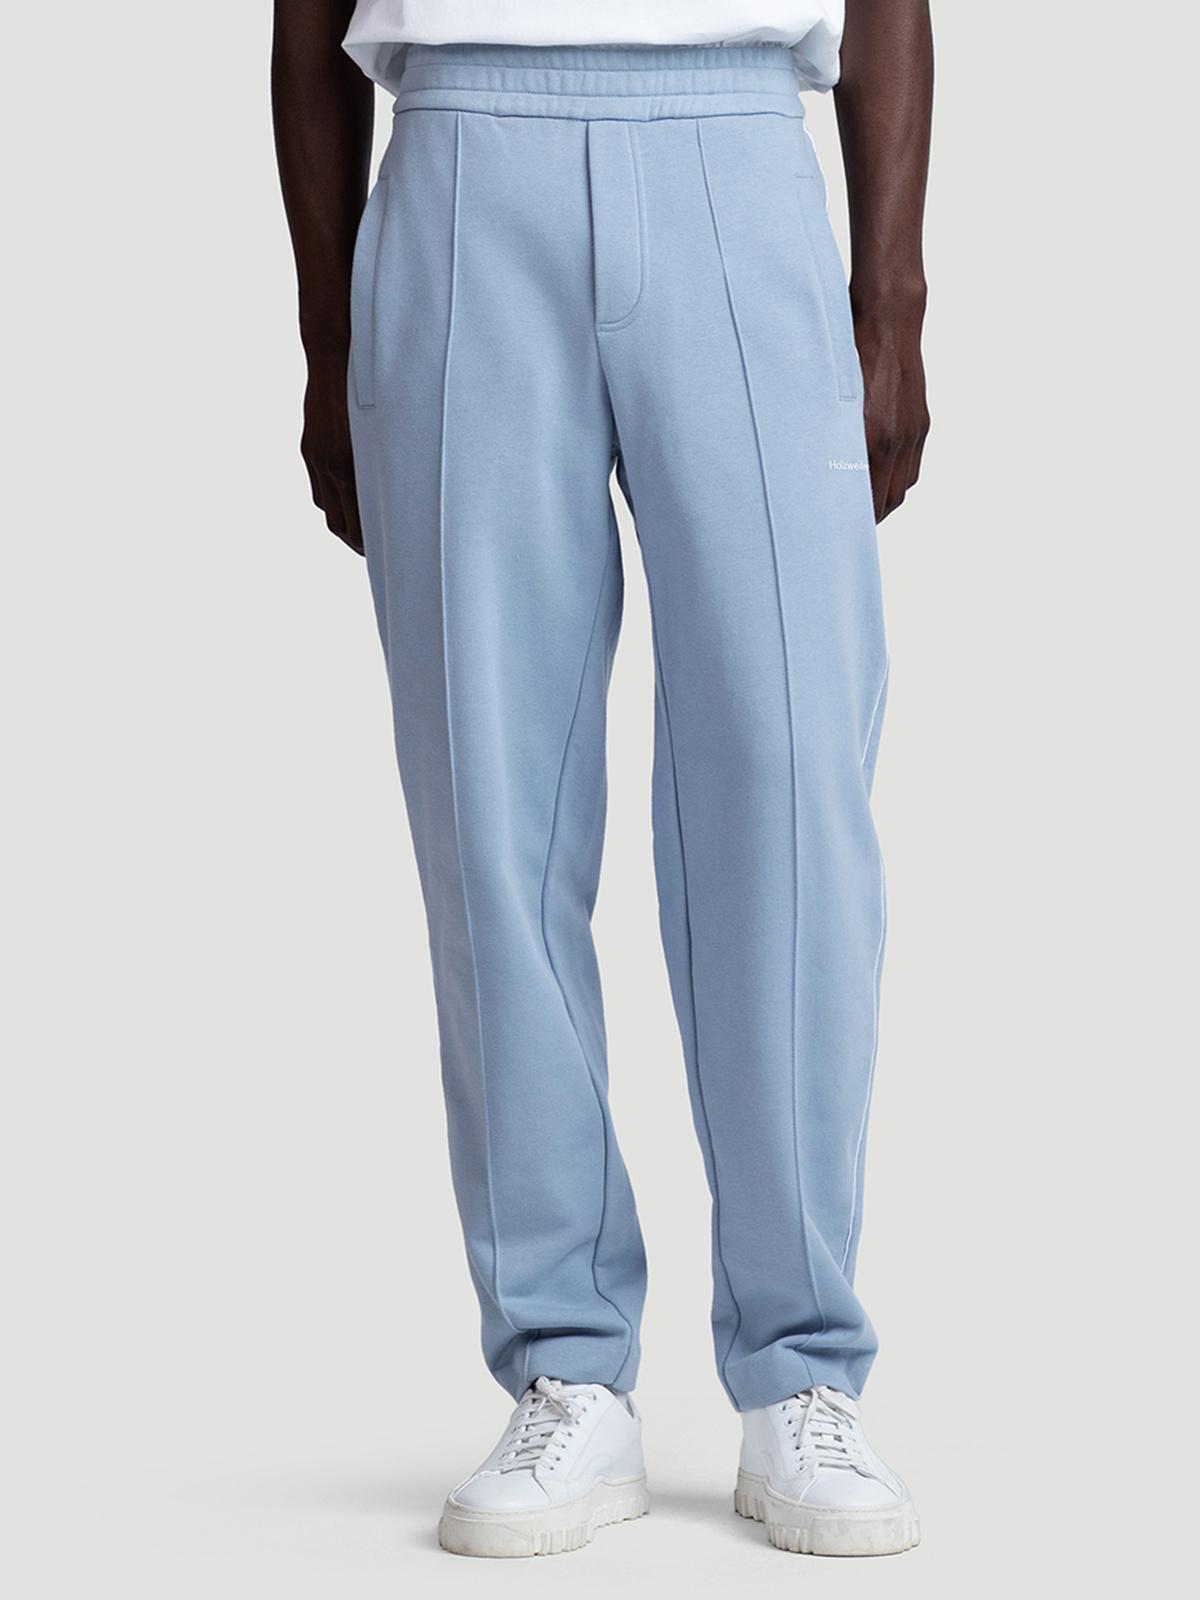 Sugaro Pant  Lt. Blue 0